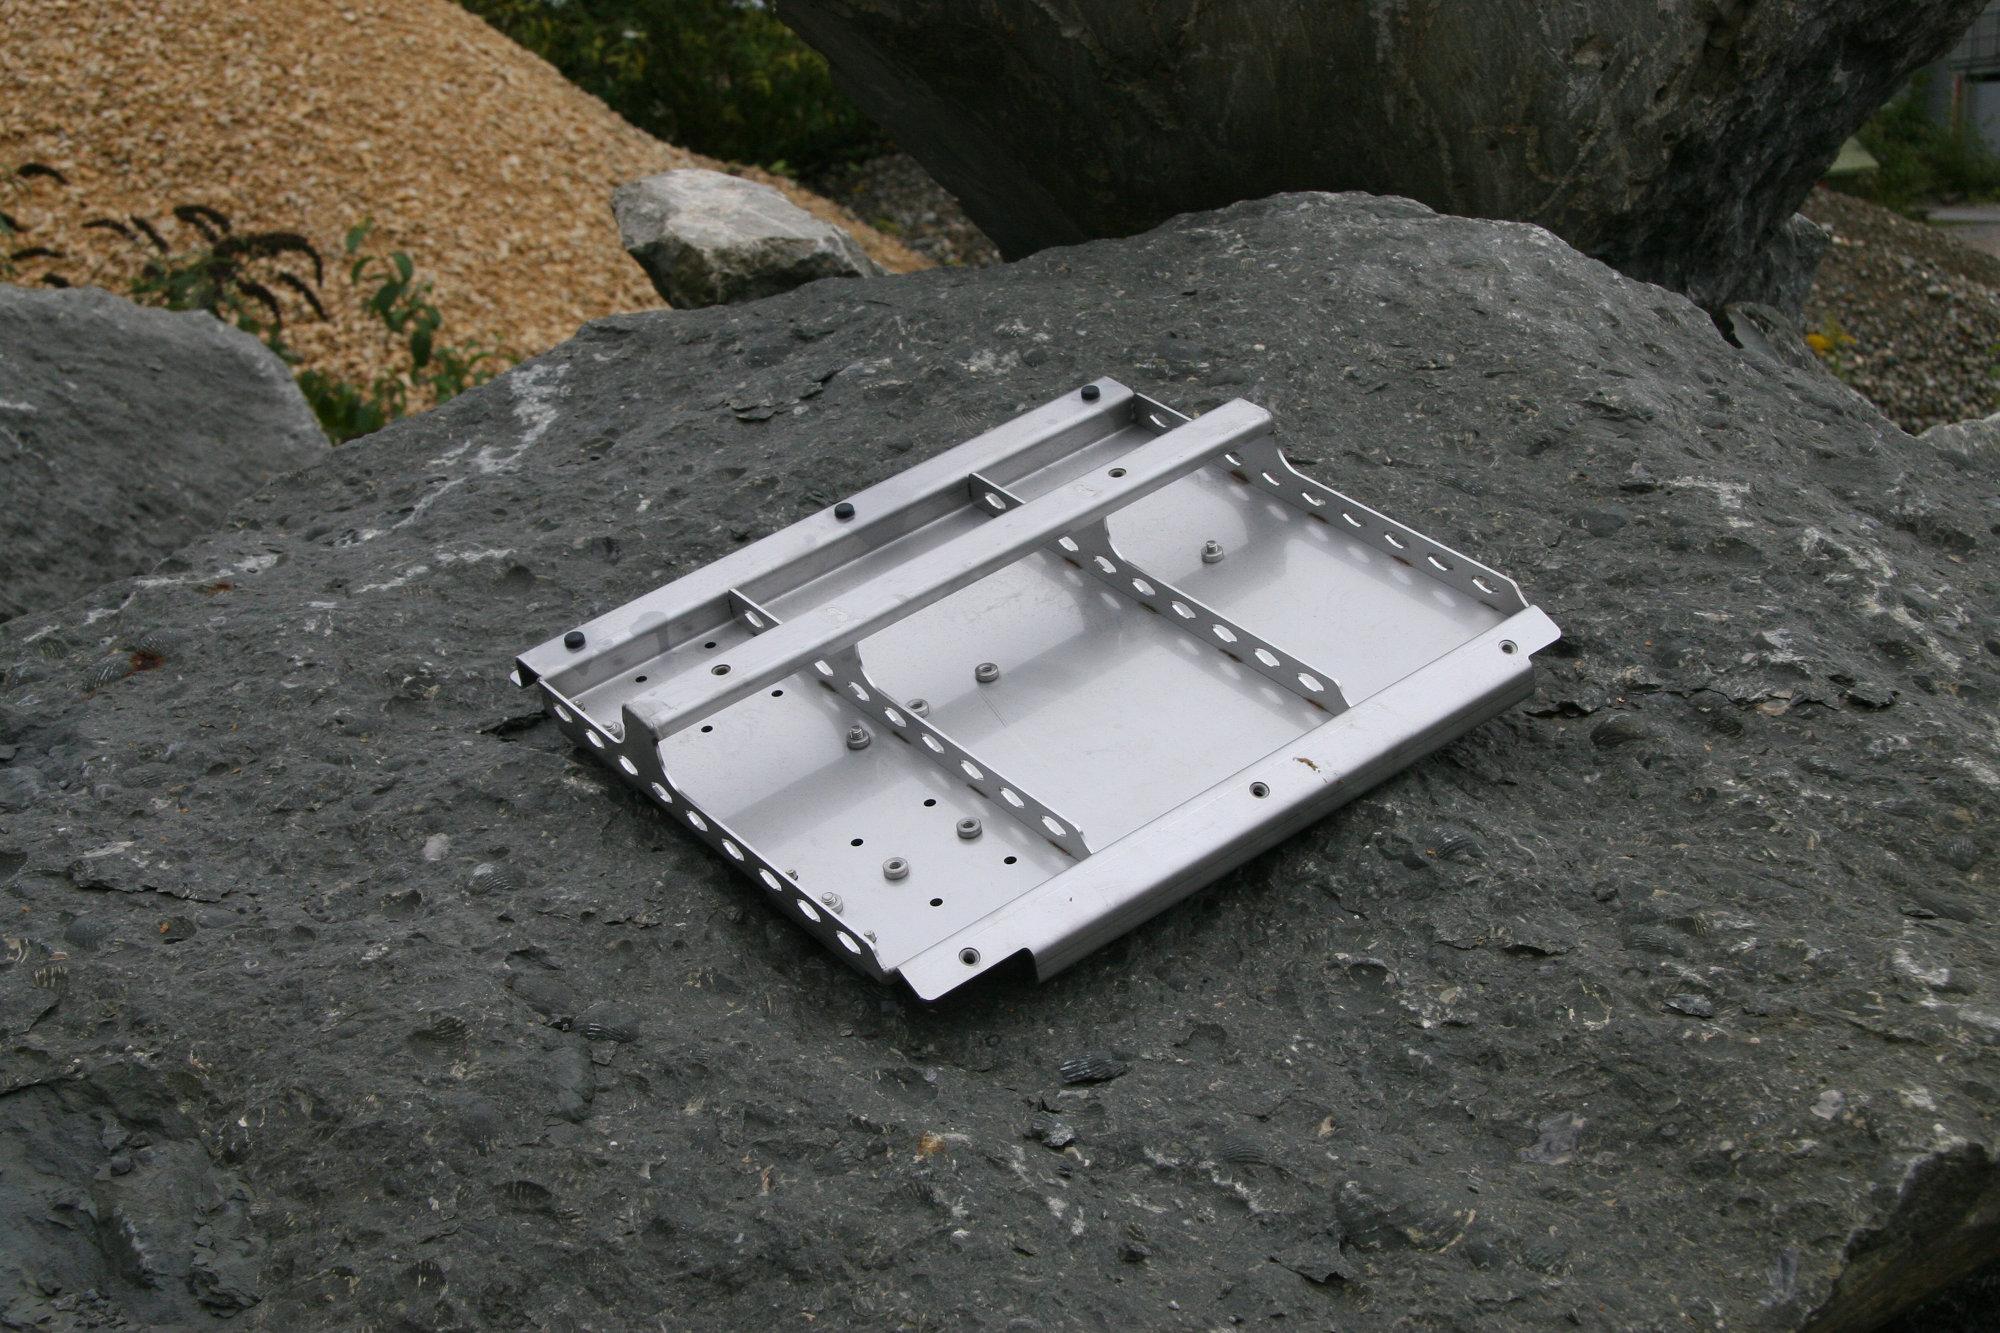 Doppelbatterietraeger Doppelbatteriehalterung Land Rover Defender.001